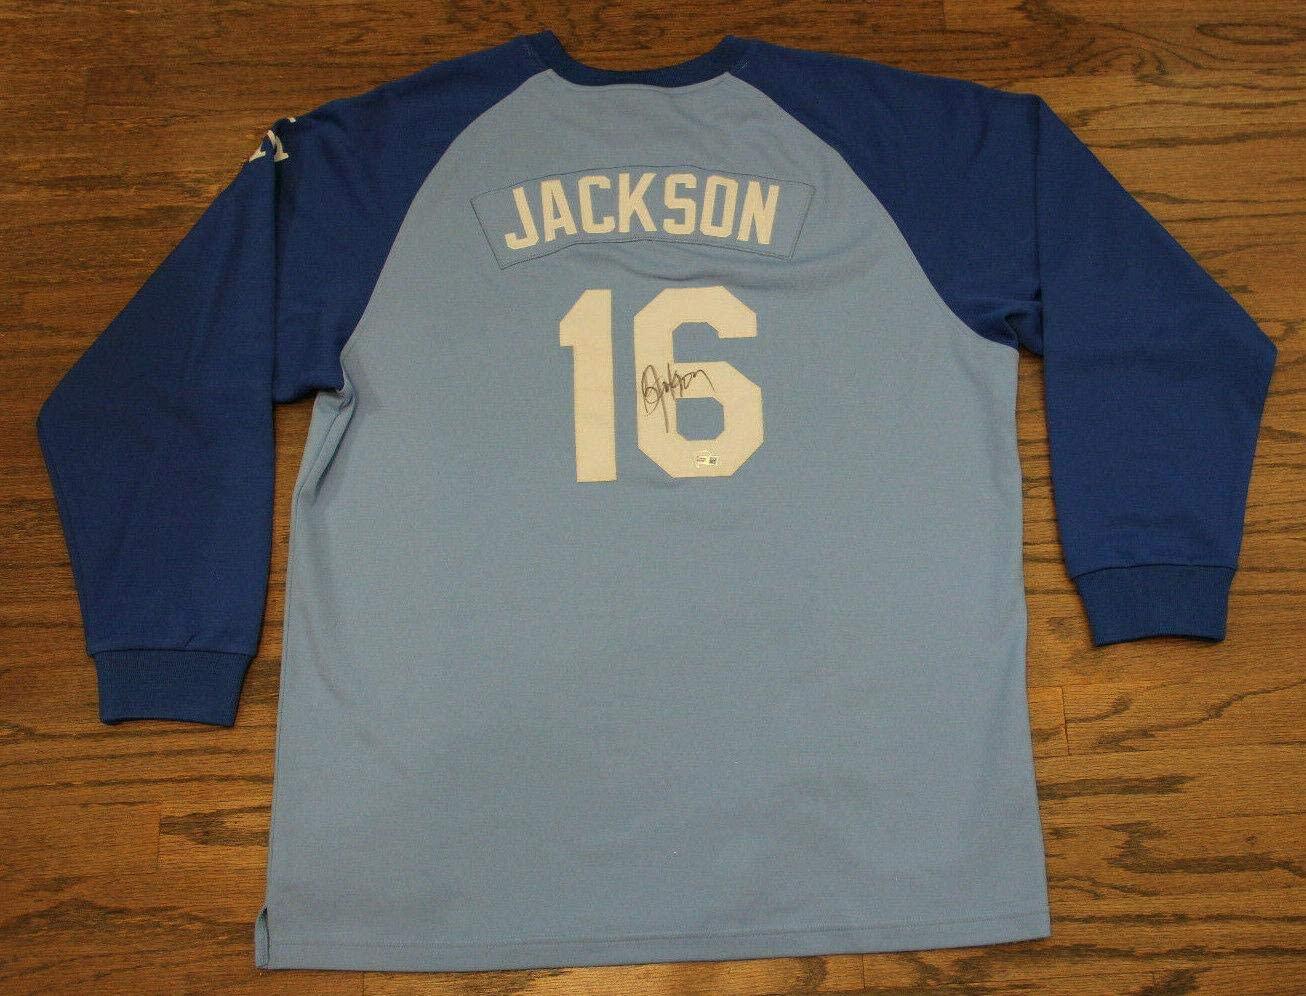 Bo Jackson Signed Jersey - Fanatics #a029962 - Fanatics Authentic Certified - Autographed MLB Jerseys